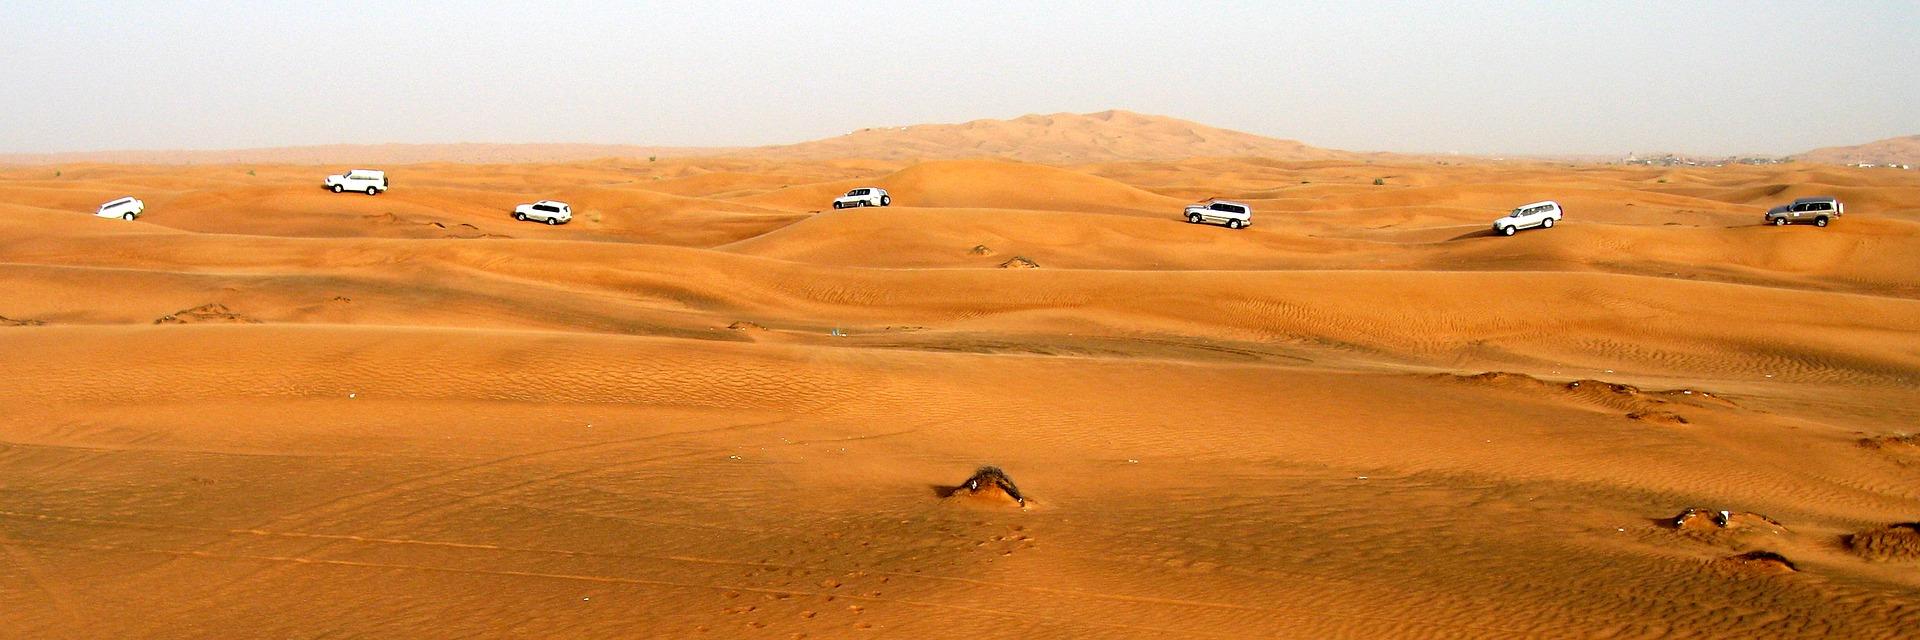 United Arab Emirates Travel Guide 9